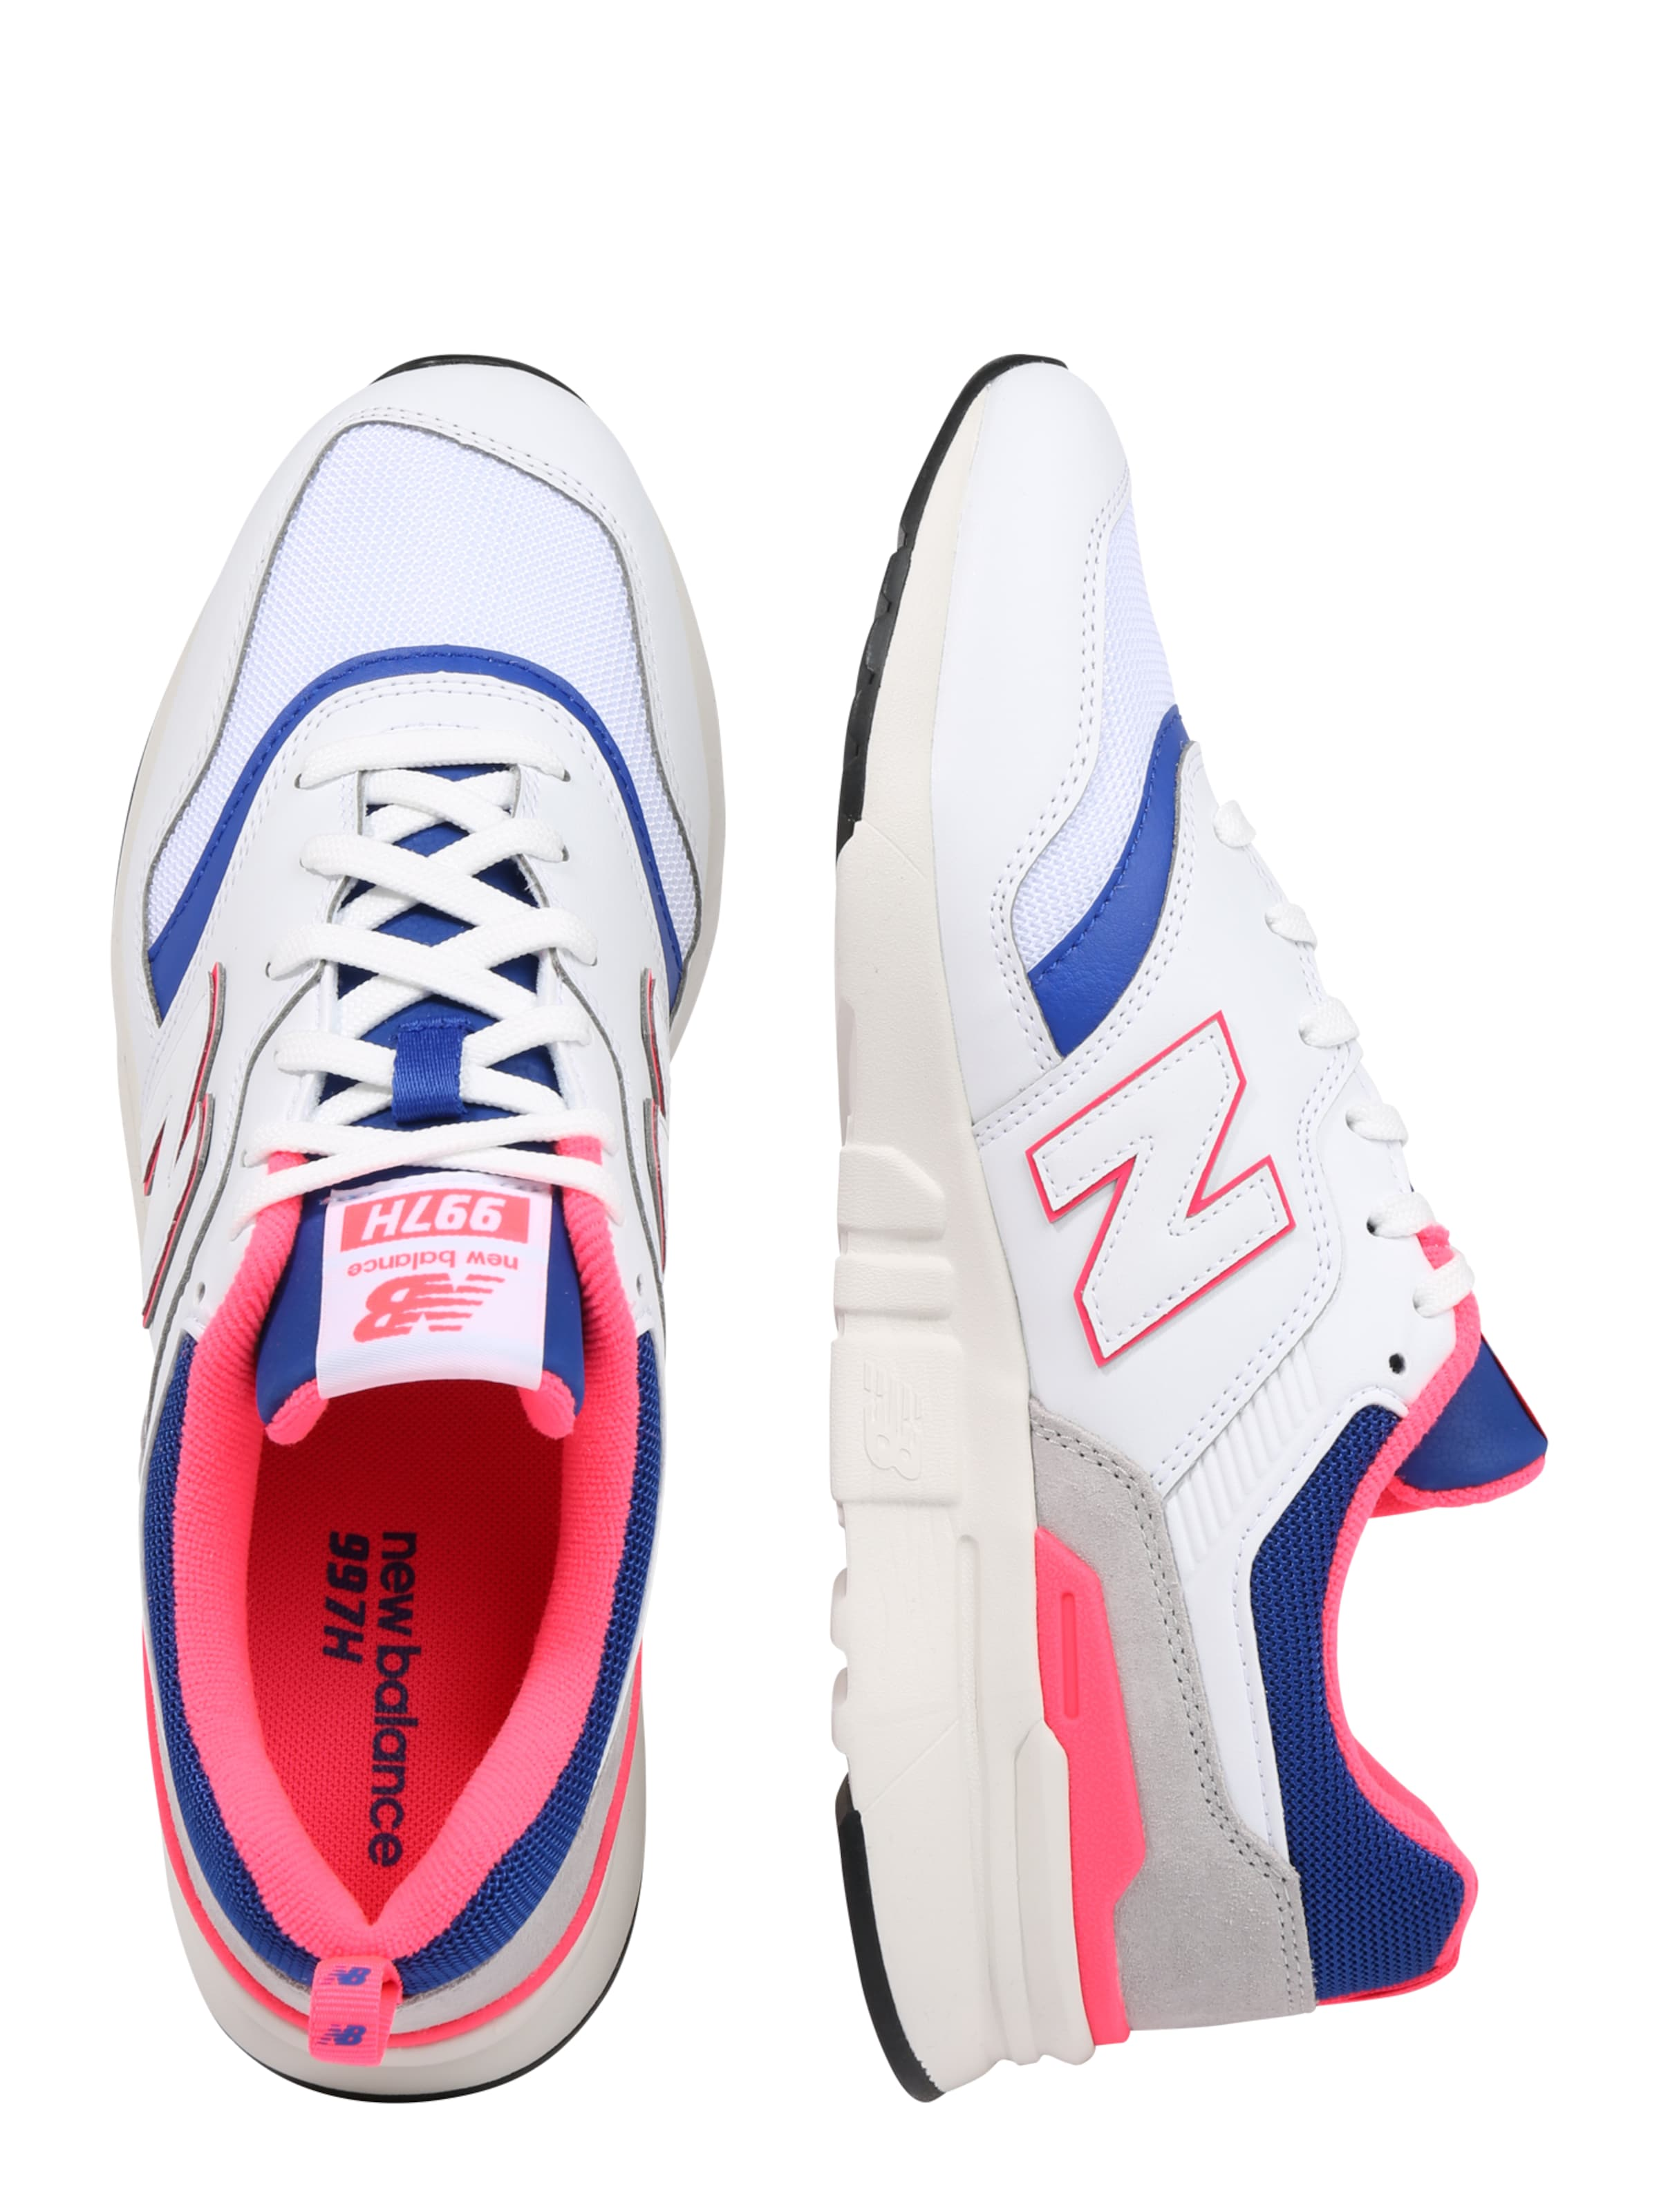 D' Balance Sneaker New 'cm997 In BlauWeiß OZwiuTPkXl